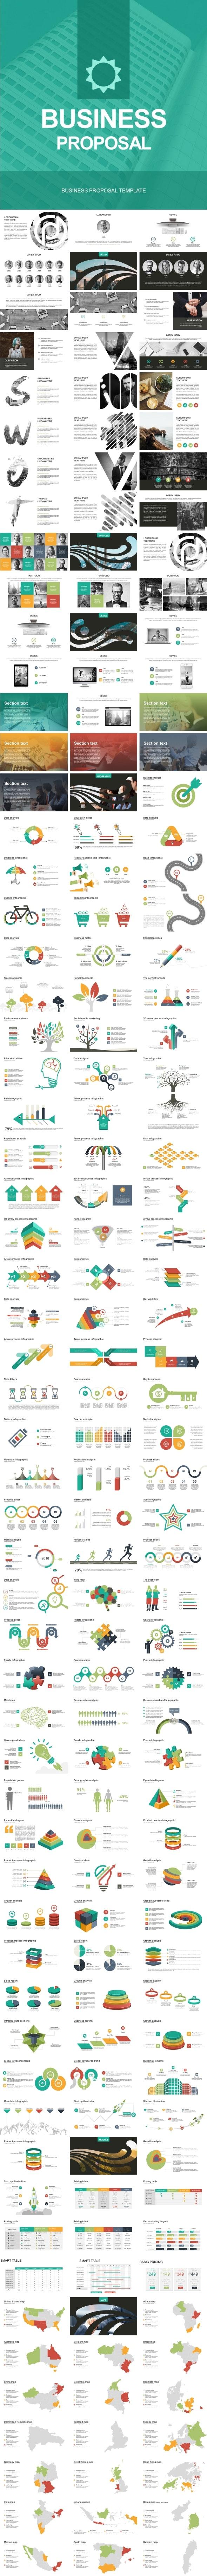 Business Proposal - Google Slides Presentation Templates